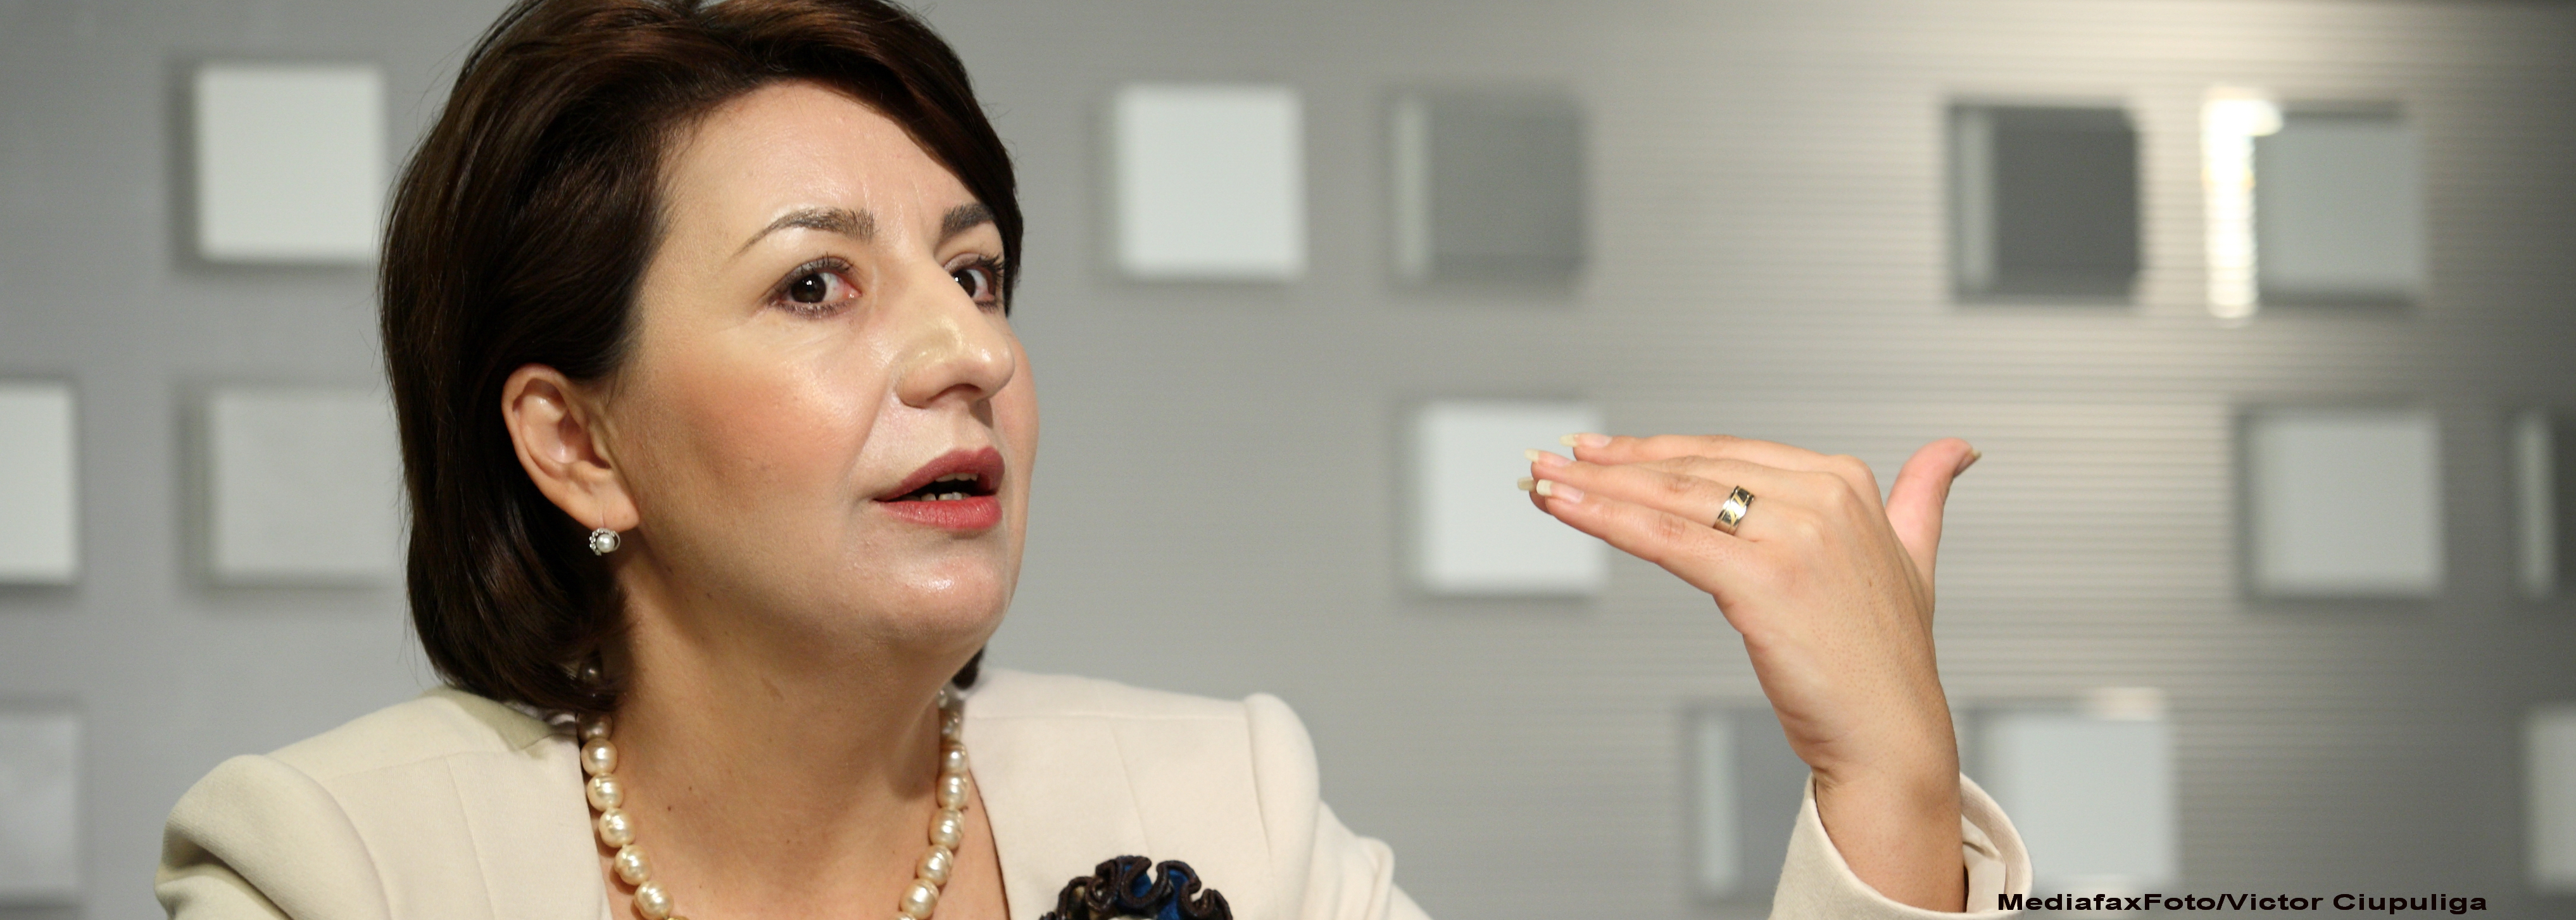 120.000 de bugetari vor fi concediati in 2012. Sulfina Barbu: Se fac analize pentru fiecare sector